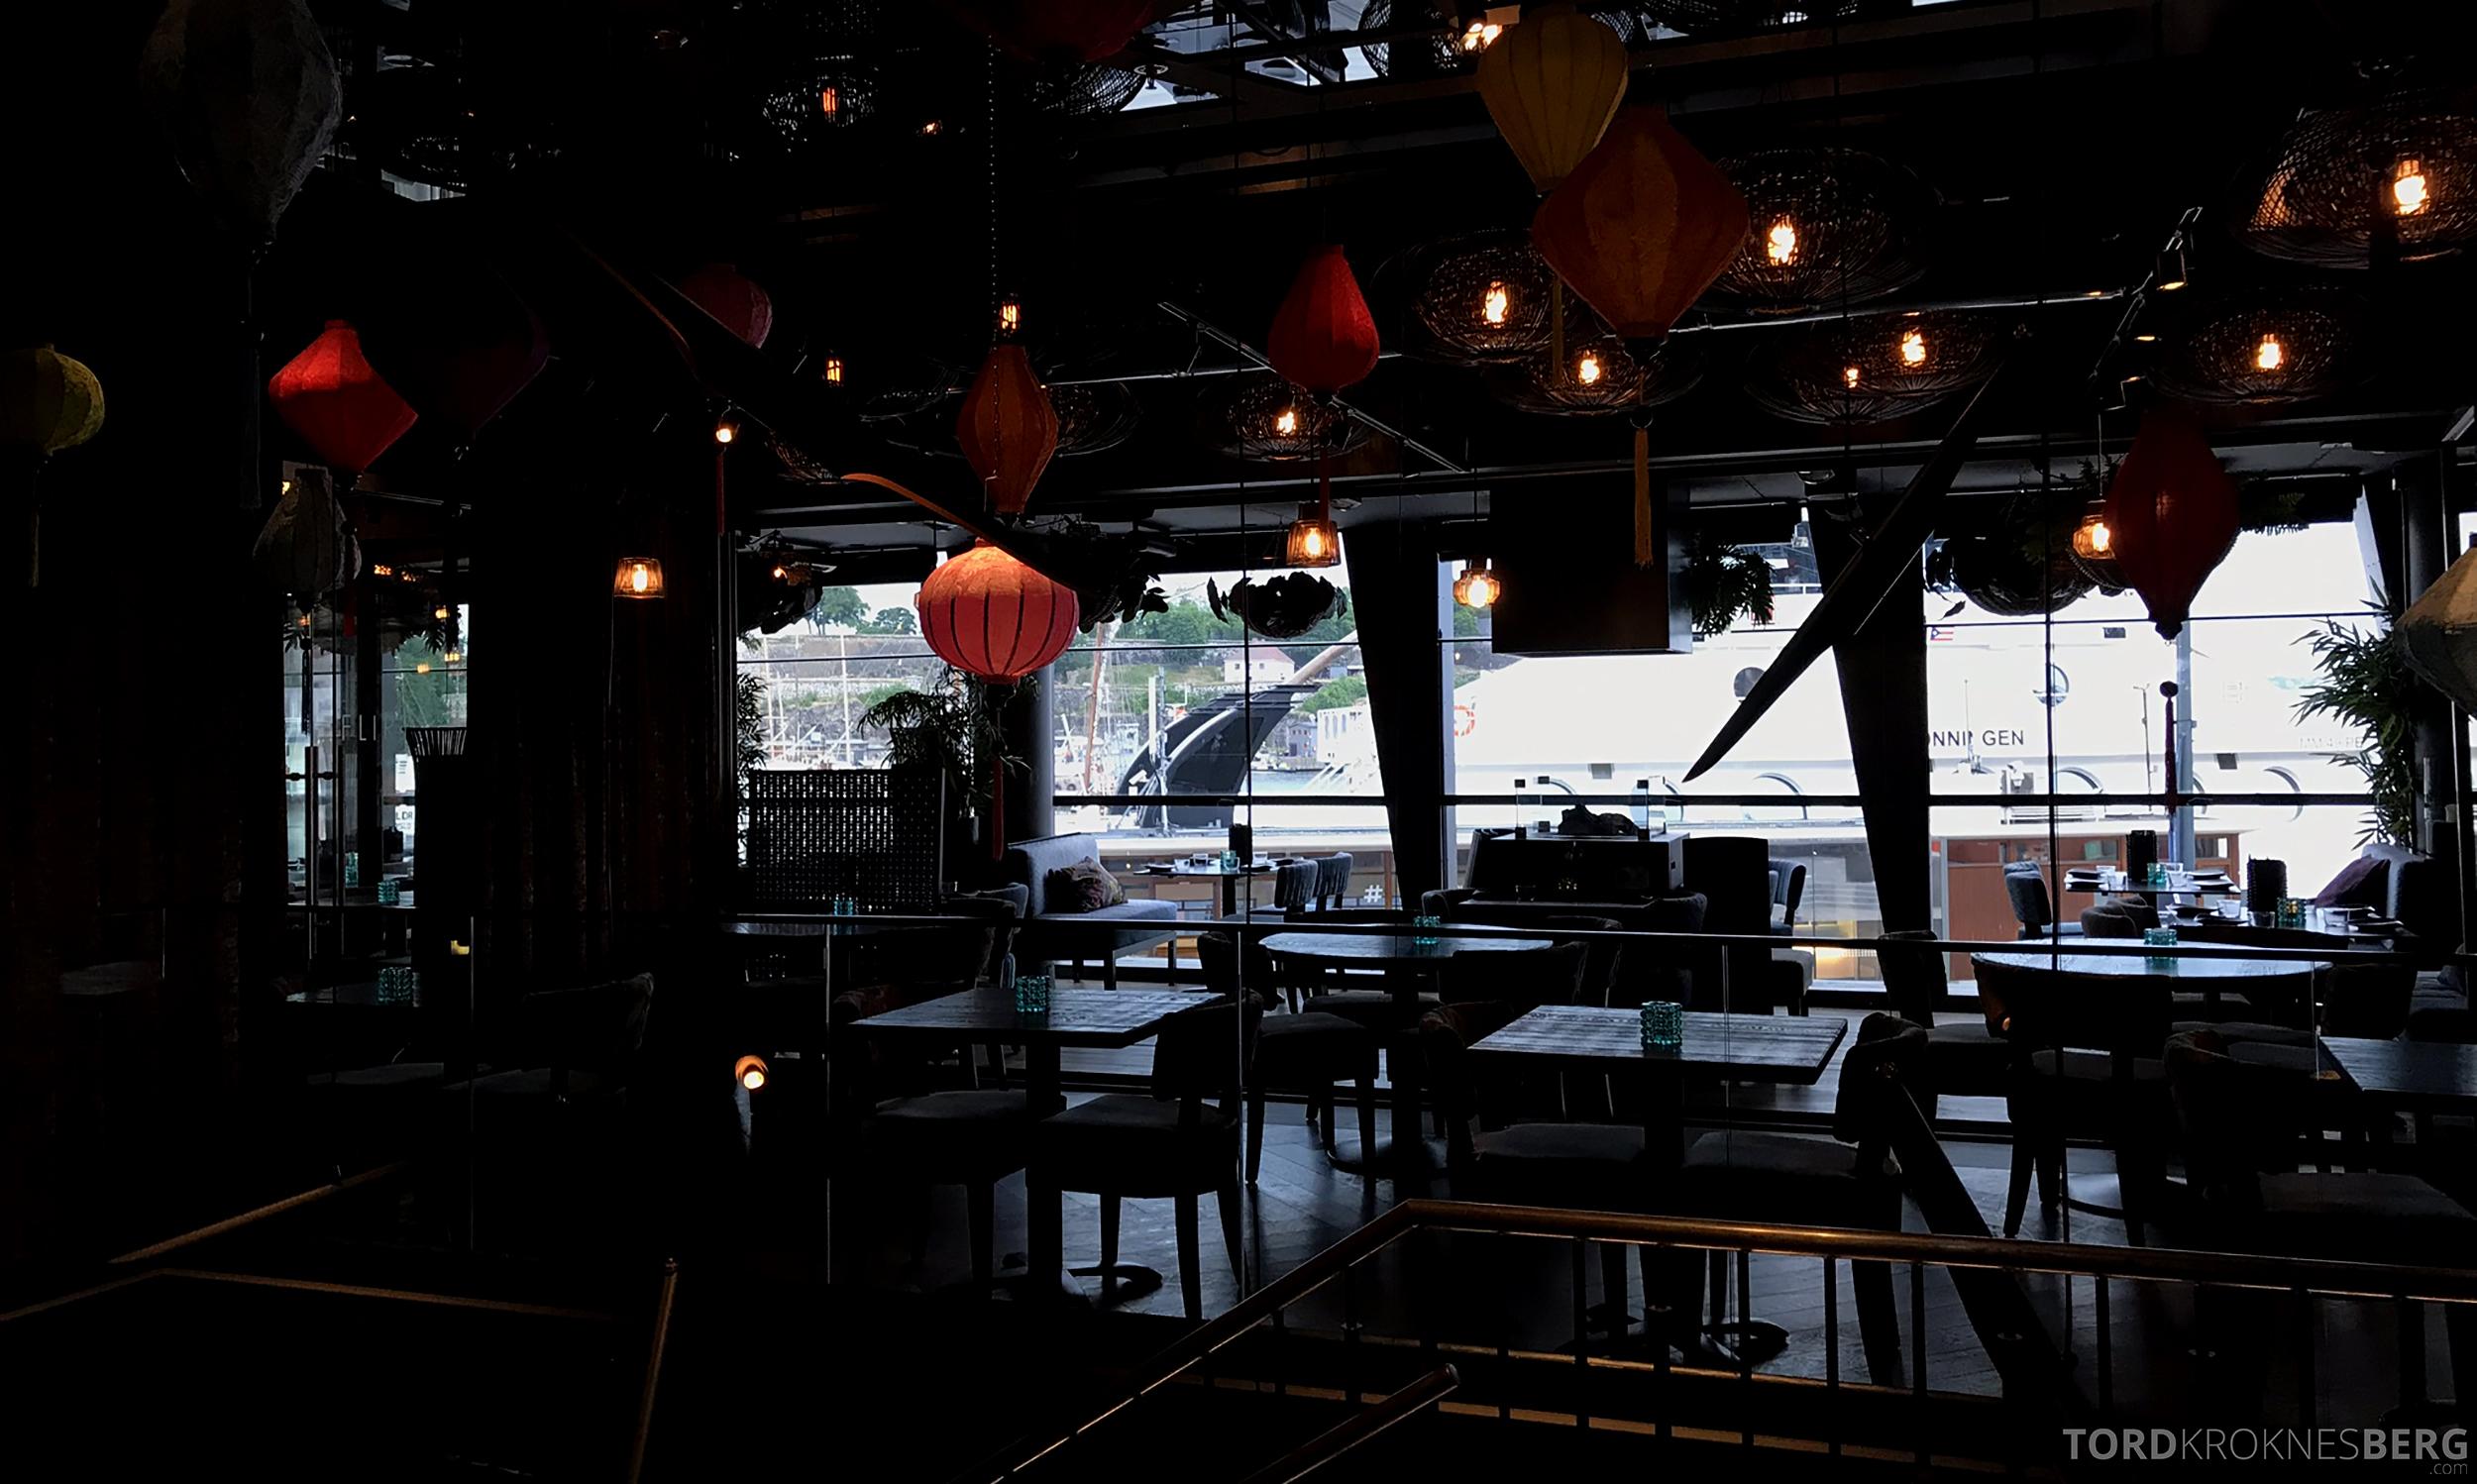 Restaurant Asia Aker Brygge Oslo lokale